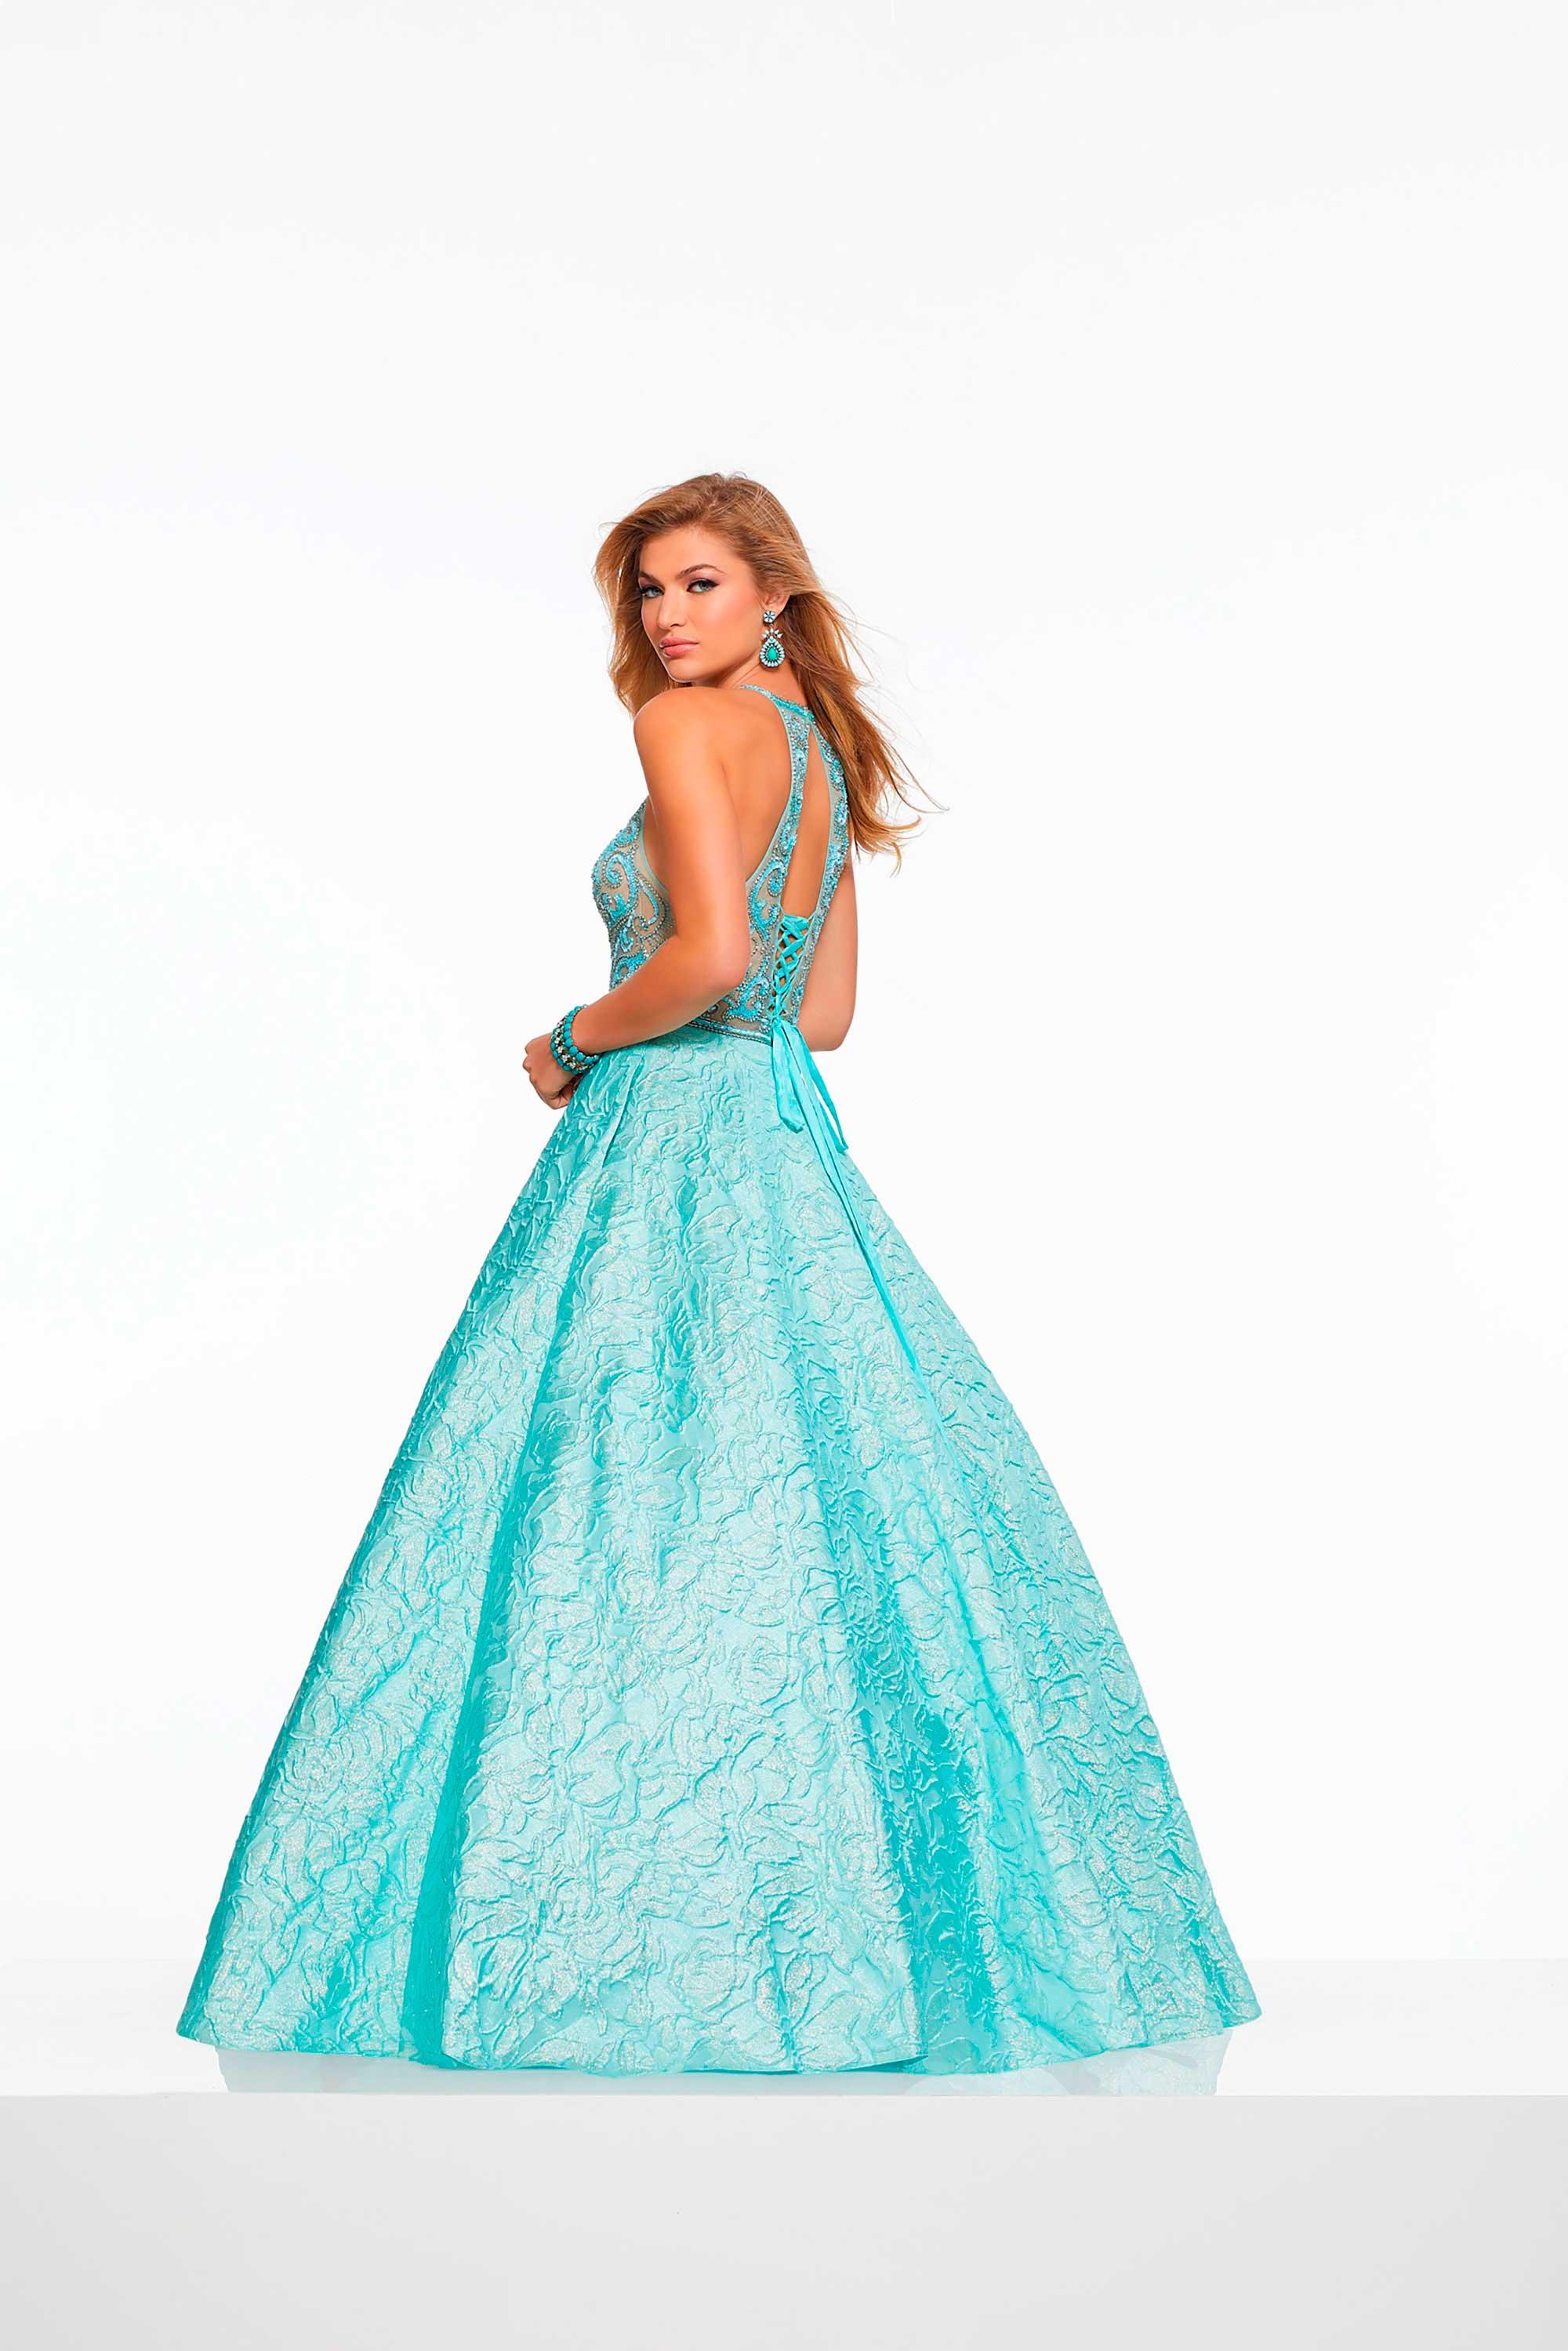 Vestido Lucía Fiesta 2019 mod. 43021 - 6